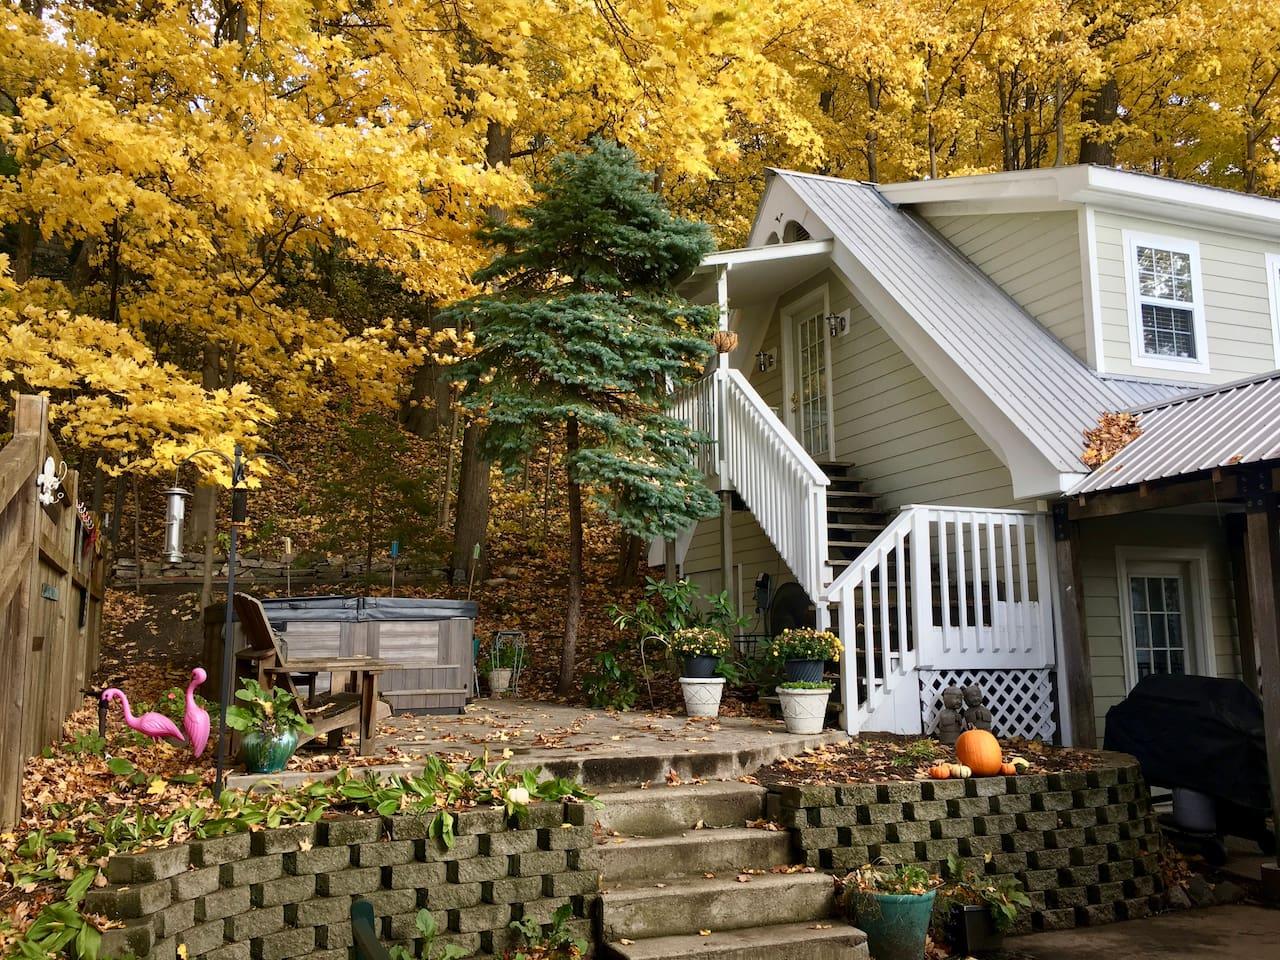 The fall brings incredible golden hues.